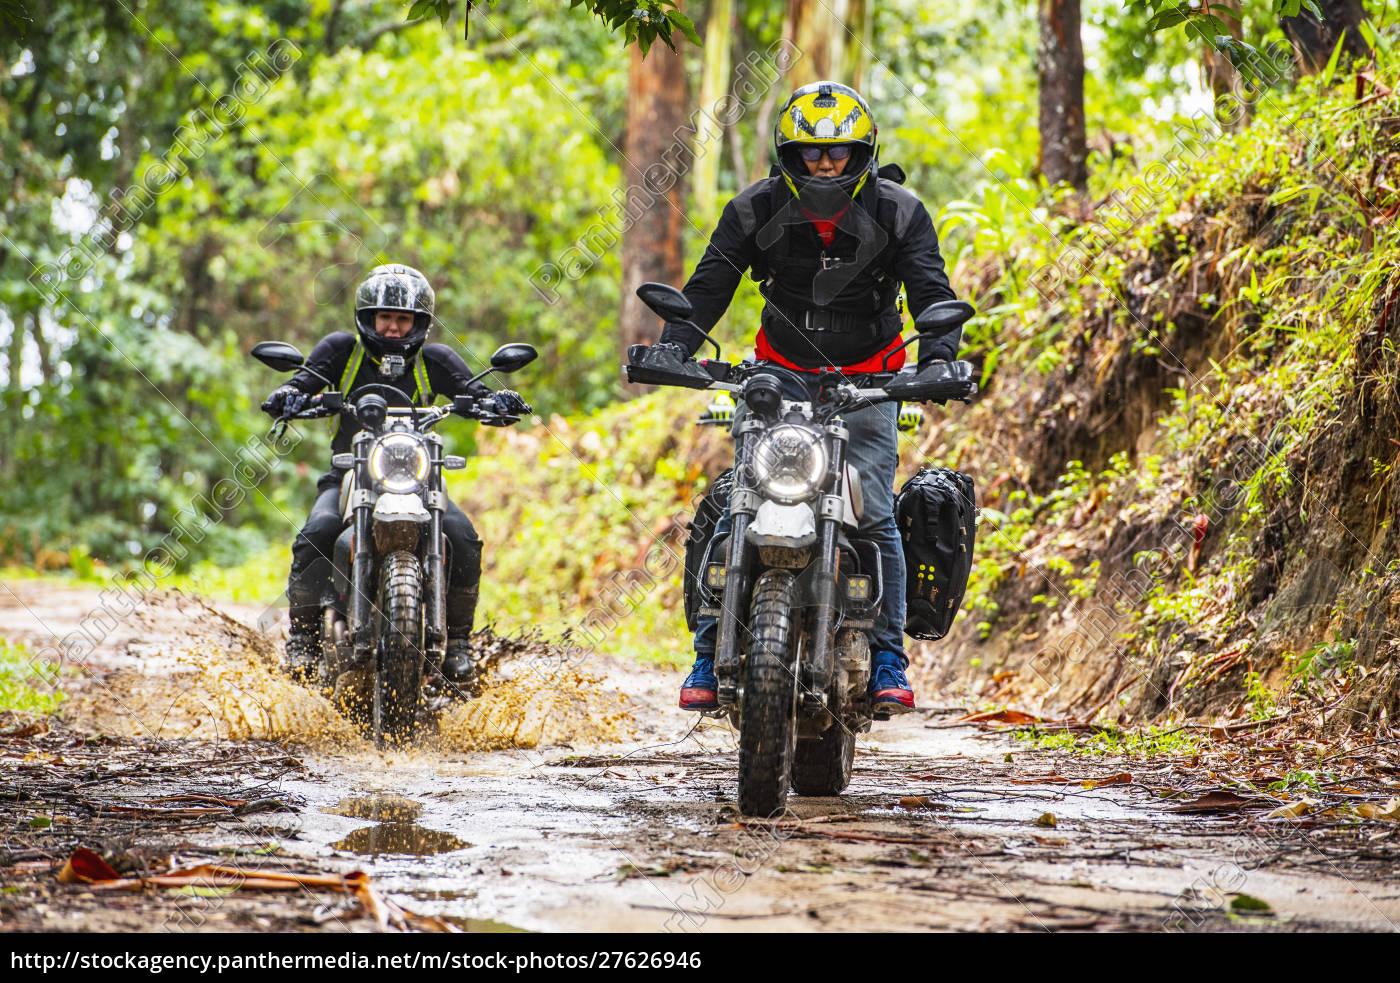 biker, fahren, off-road-motorrad, auf, feldweg, durch - 27626946